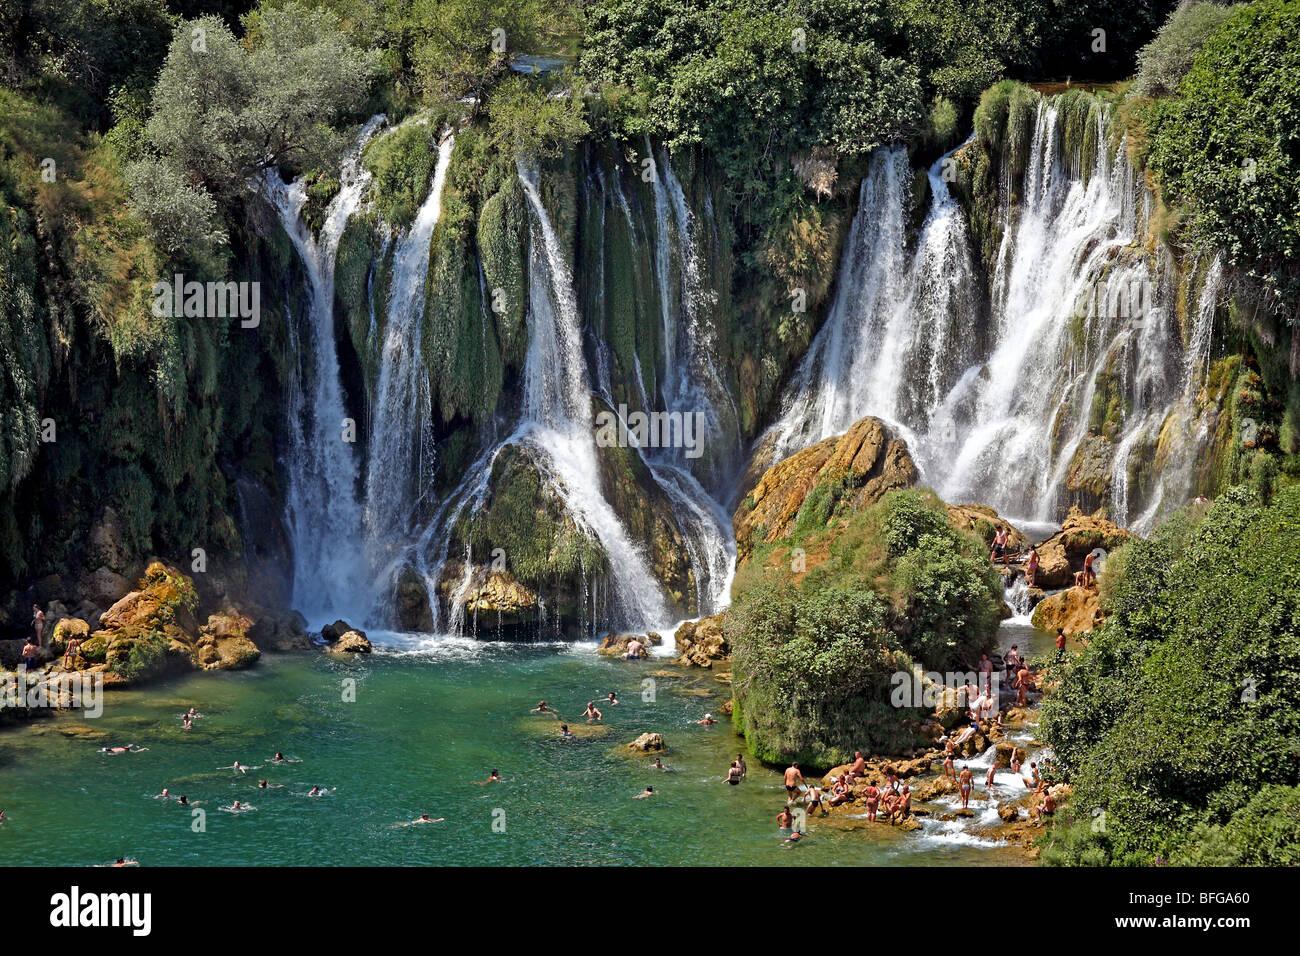 Bosnia and Herzegovina, Herzegovina Ljubuski district. Kravica Waterfalls on the Trebizat River with visiting tourists. Stock Photo